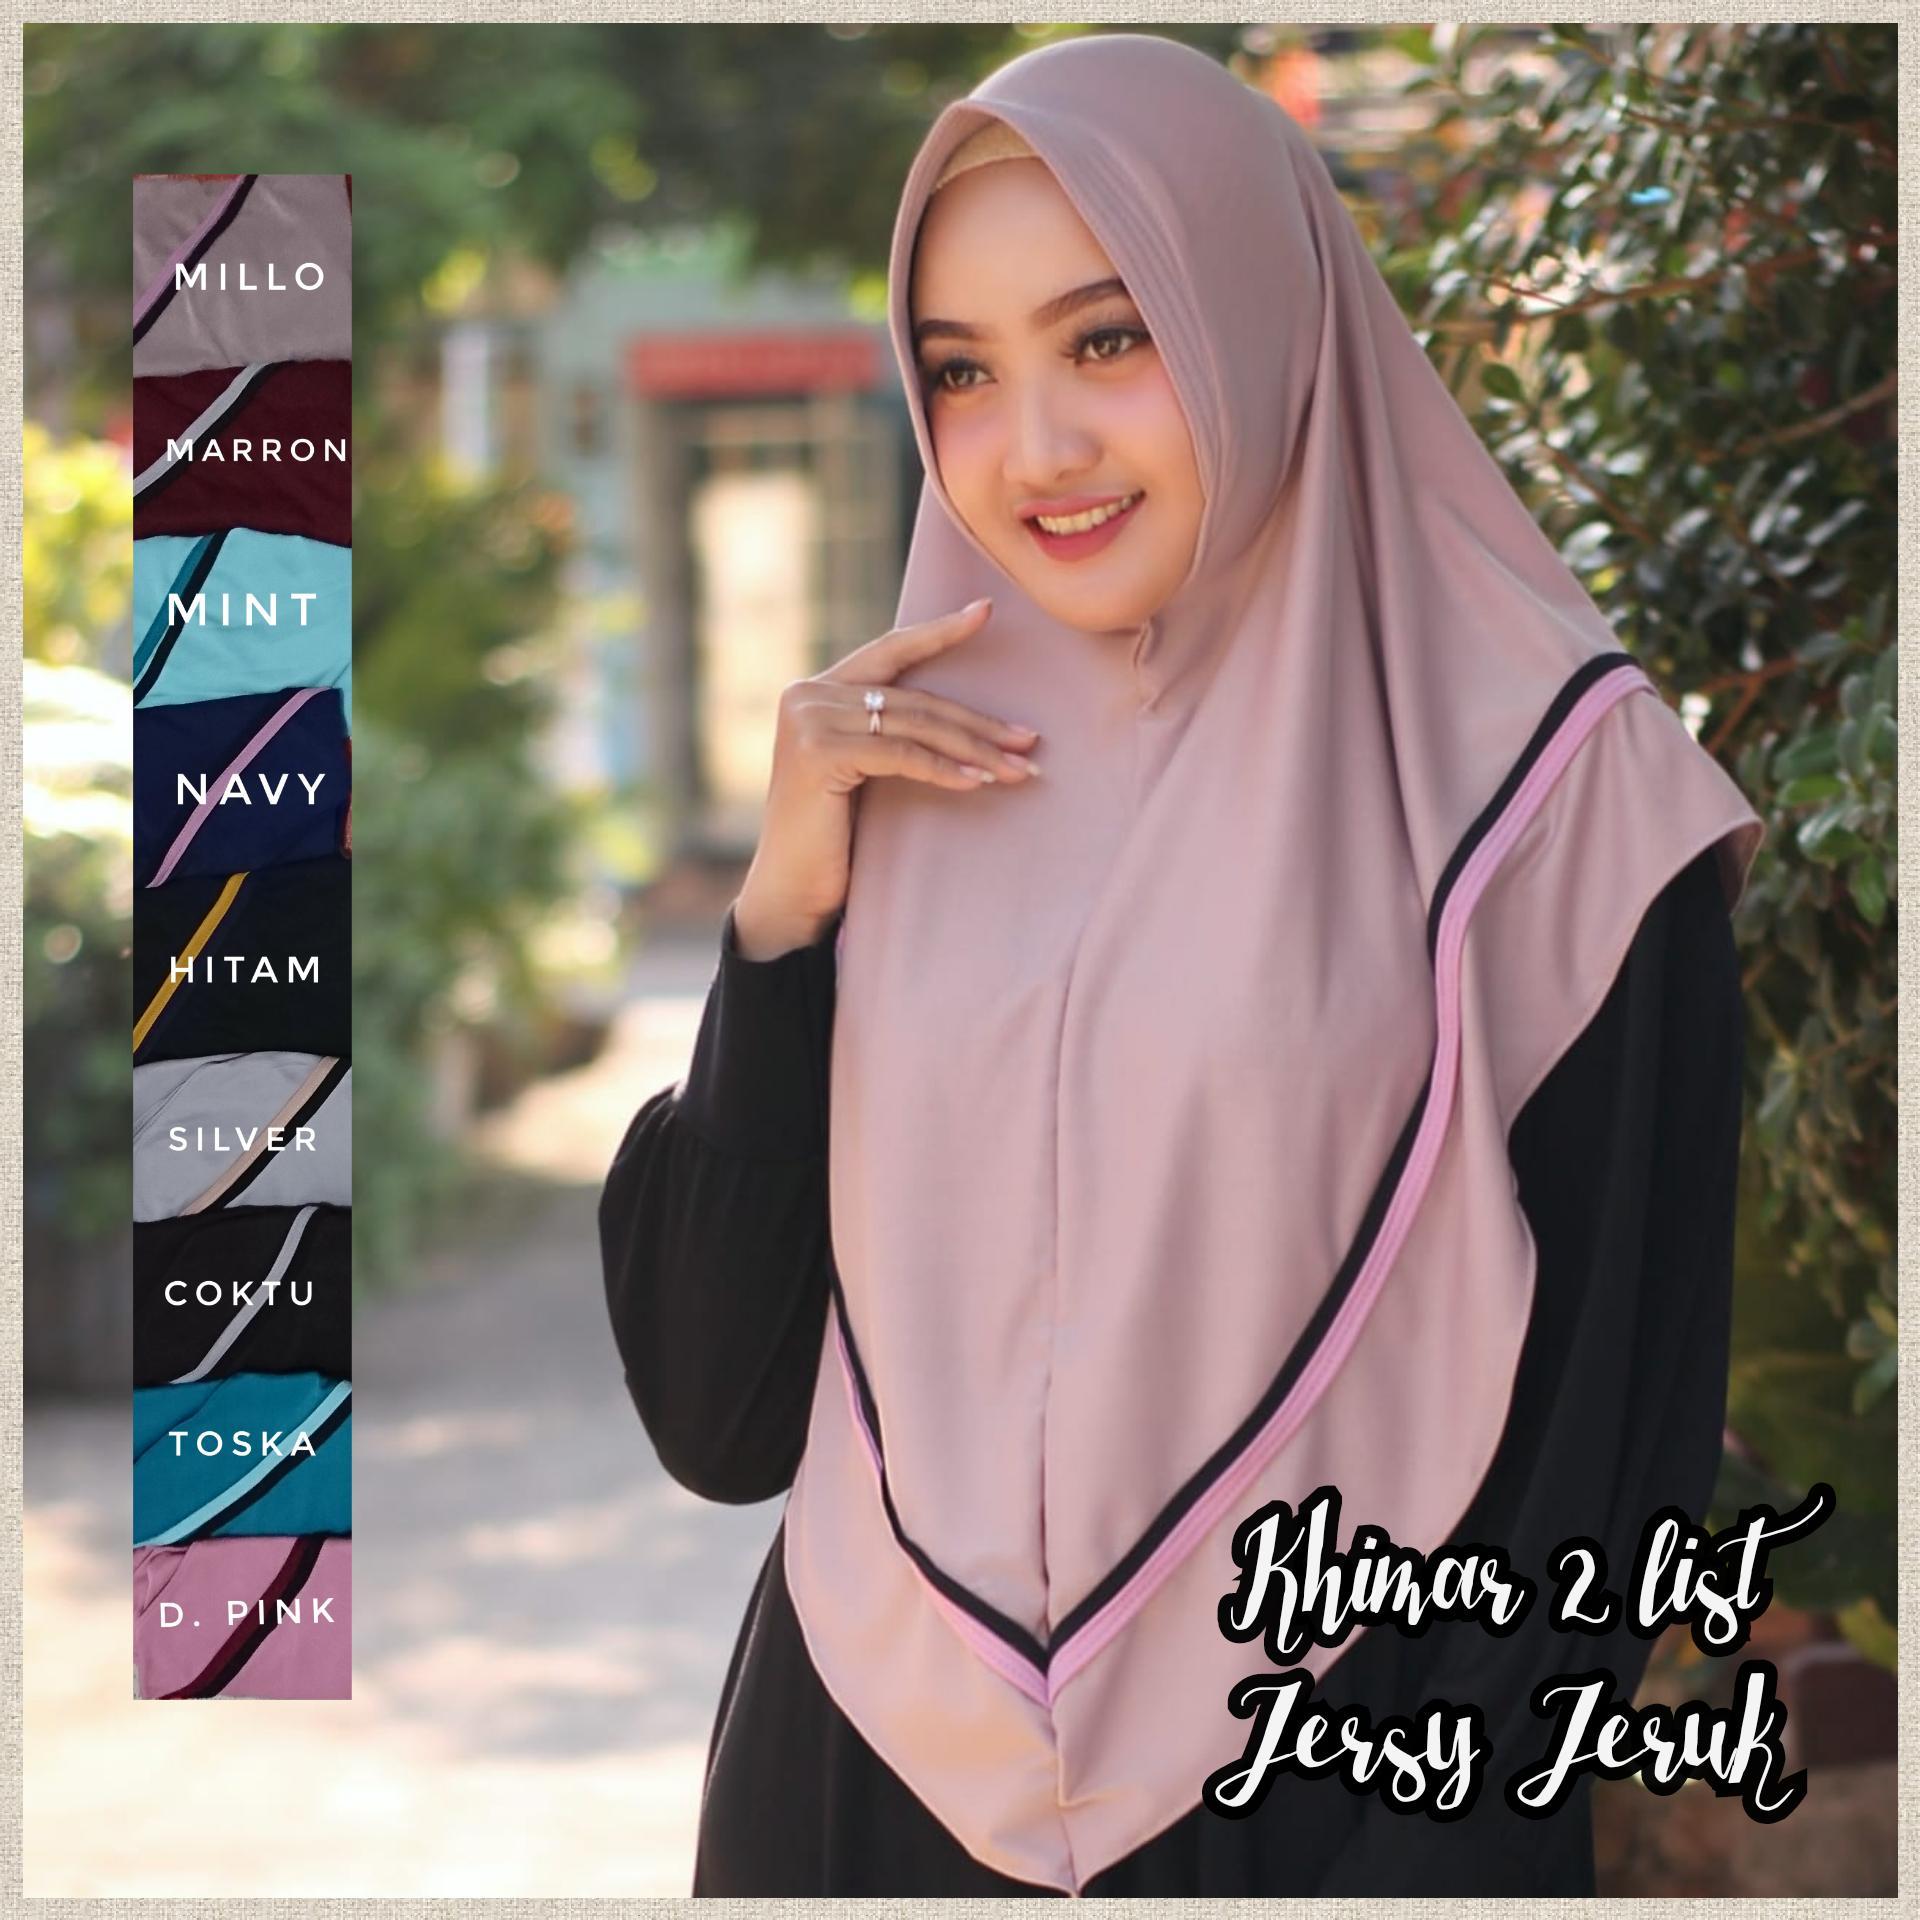 Khimar Instan Harian 2 list Murah / Jilbab Hijab Muslim